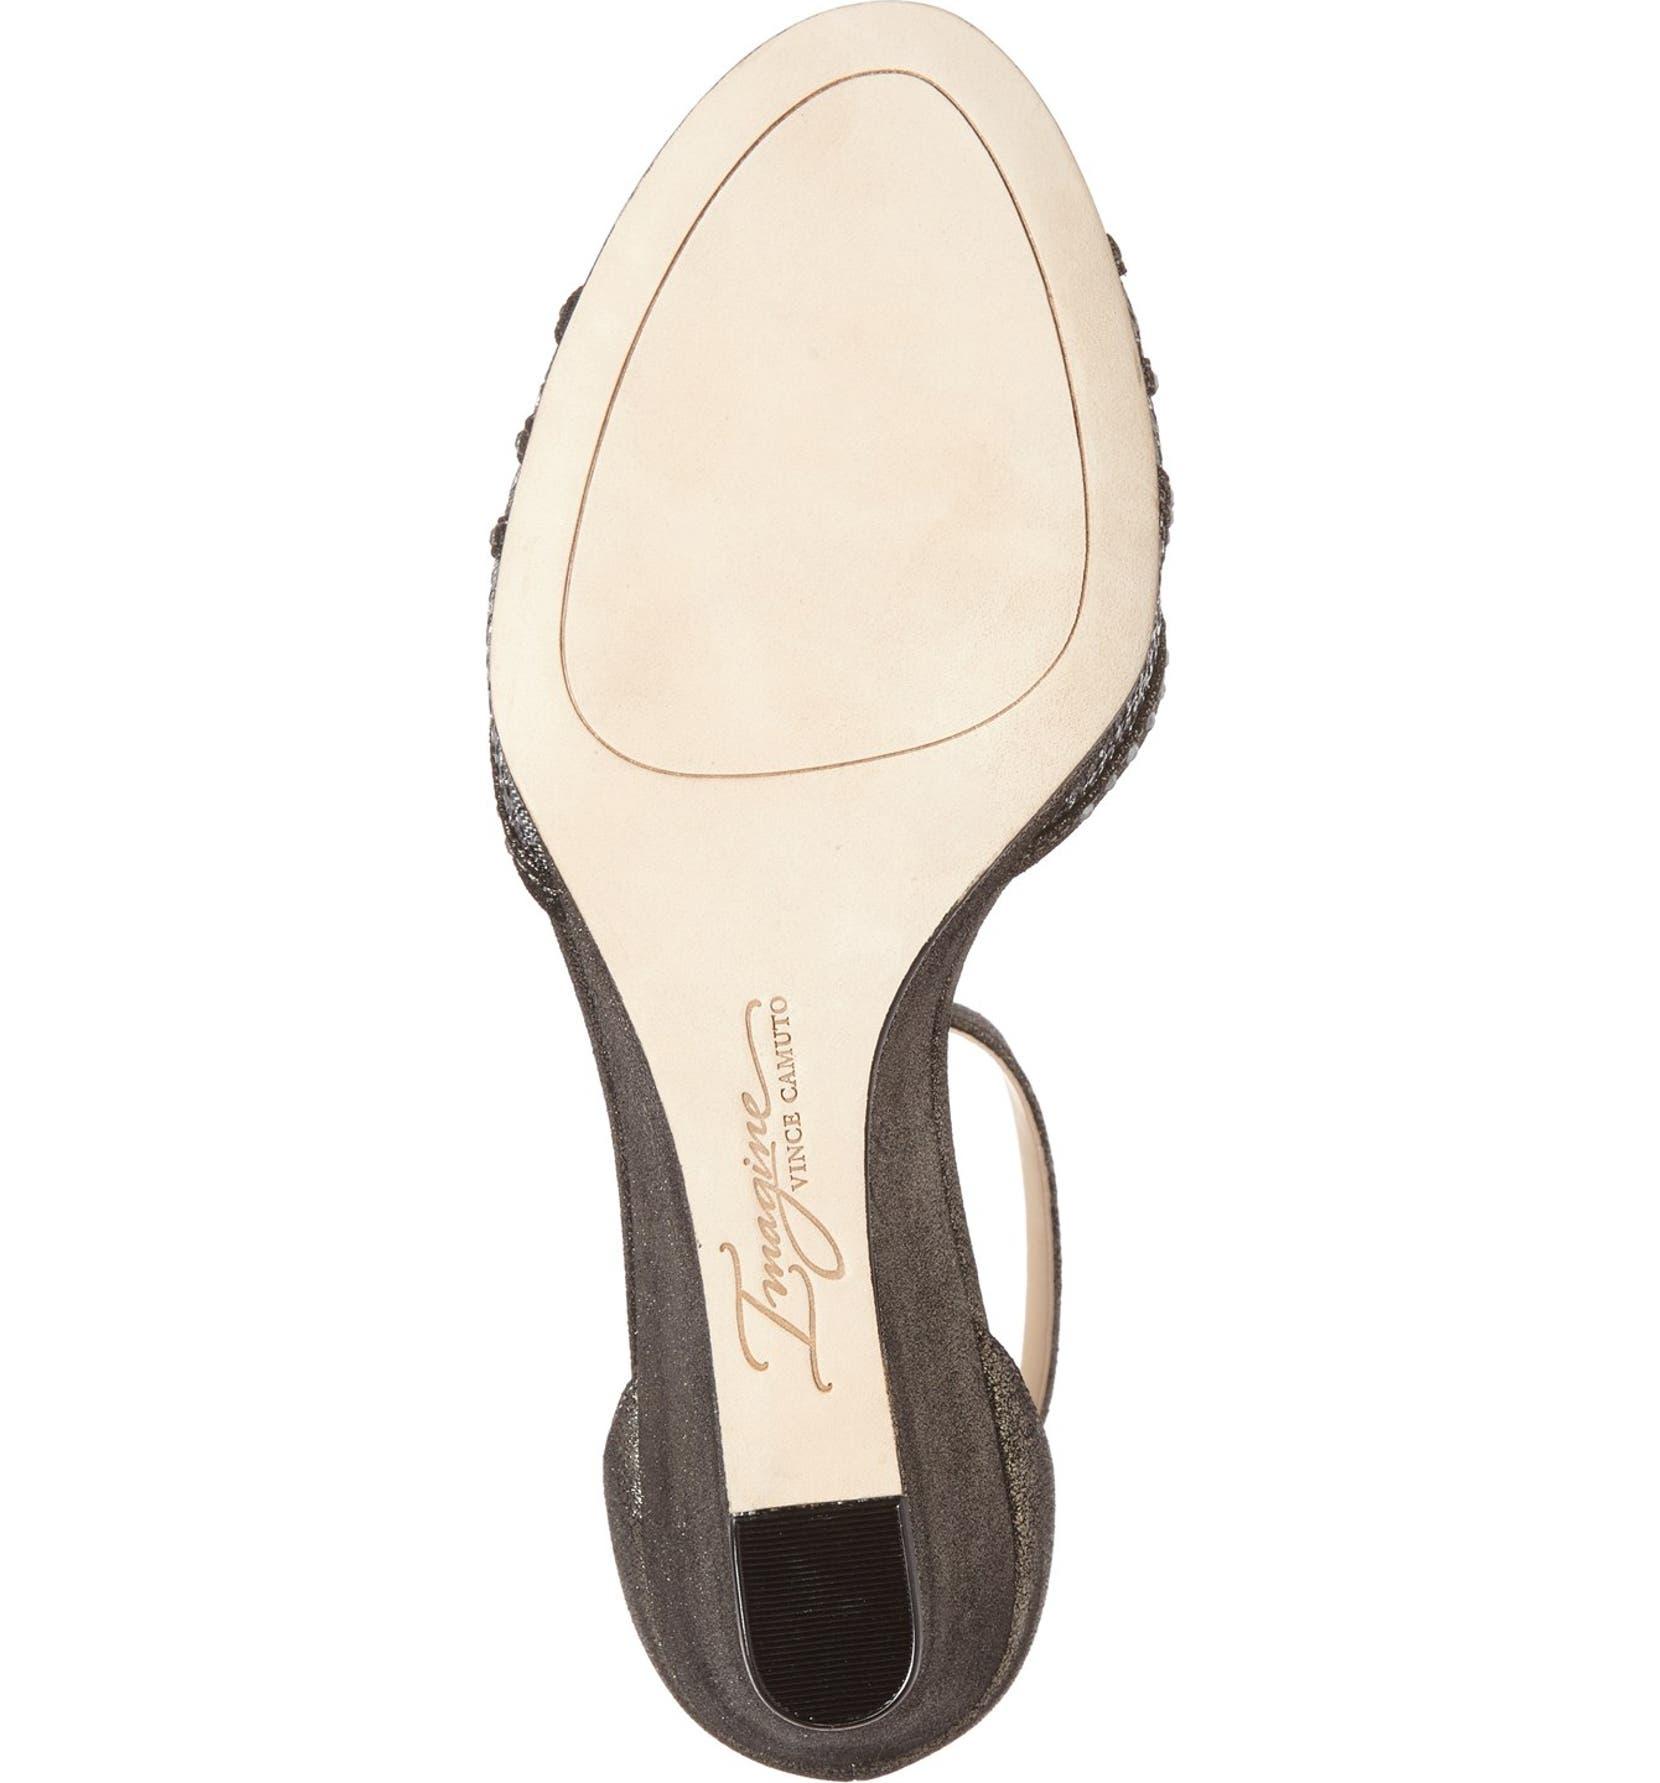 e280ec1c25 Imagine by Vince Camuto 'Joan' Studded Wedge Sandal (Women)   Nordstrom